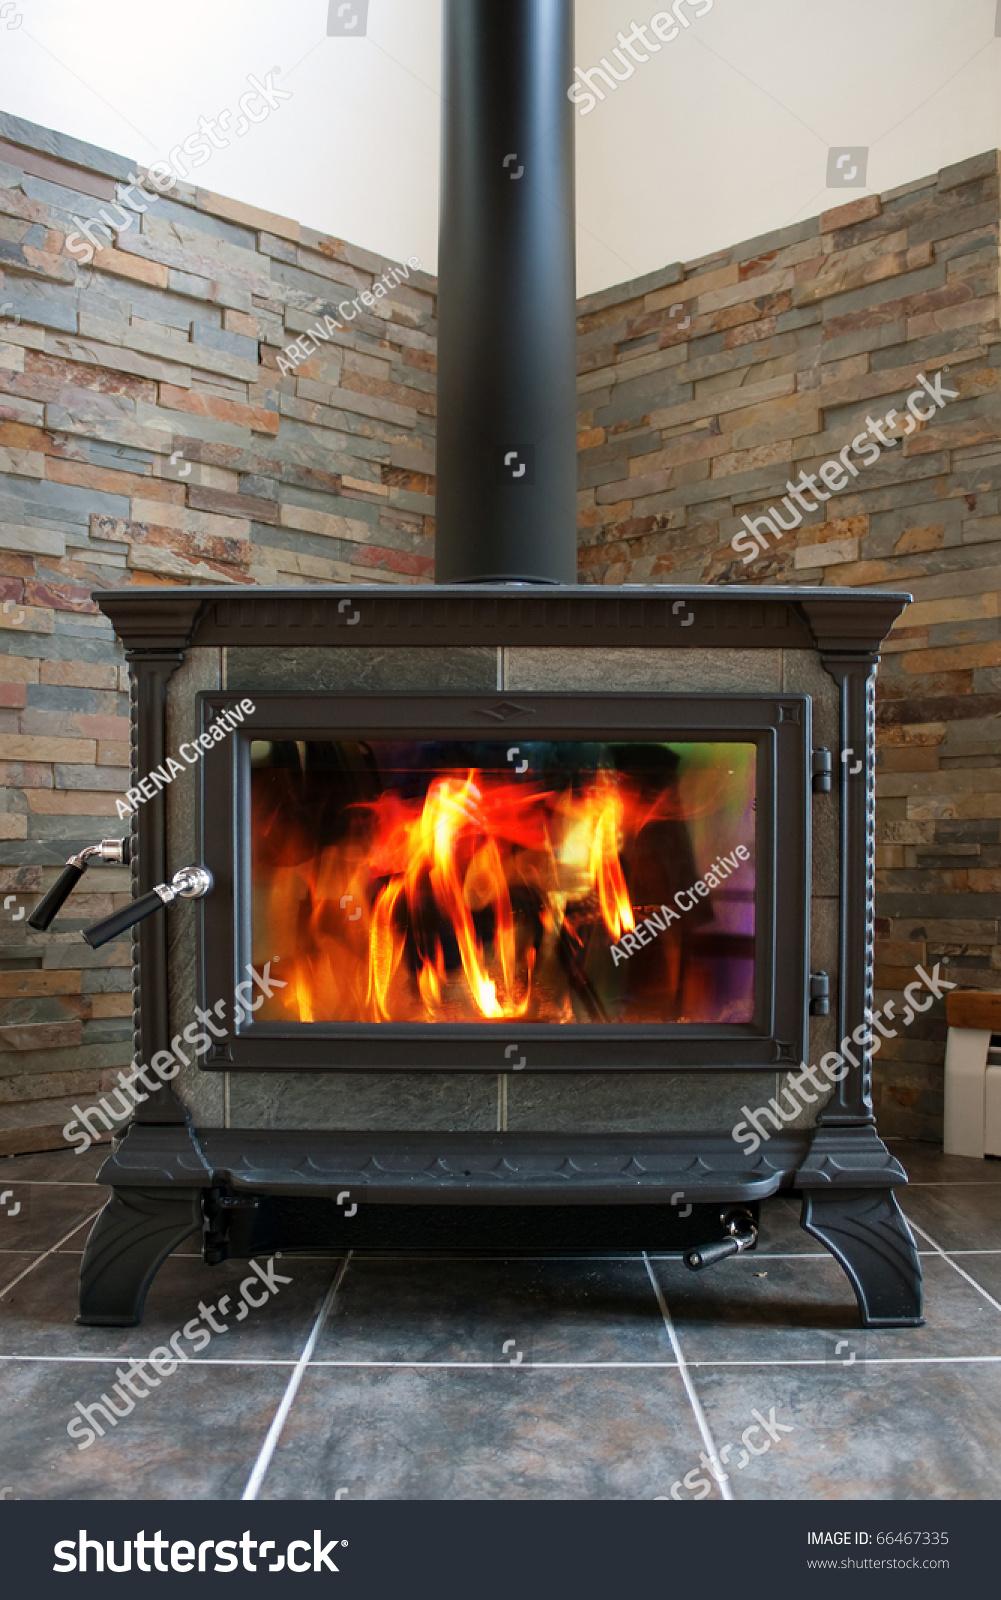 new cast iron wood stove burning stock photo 66467335 shutterstock